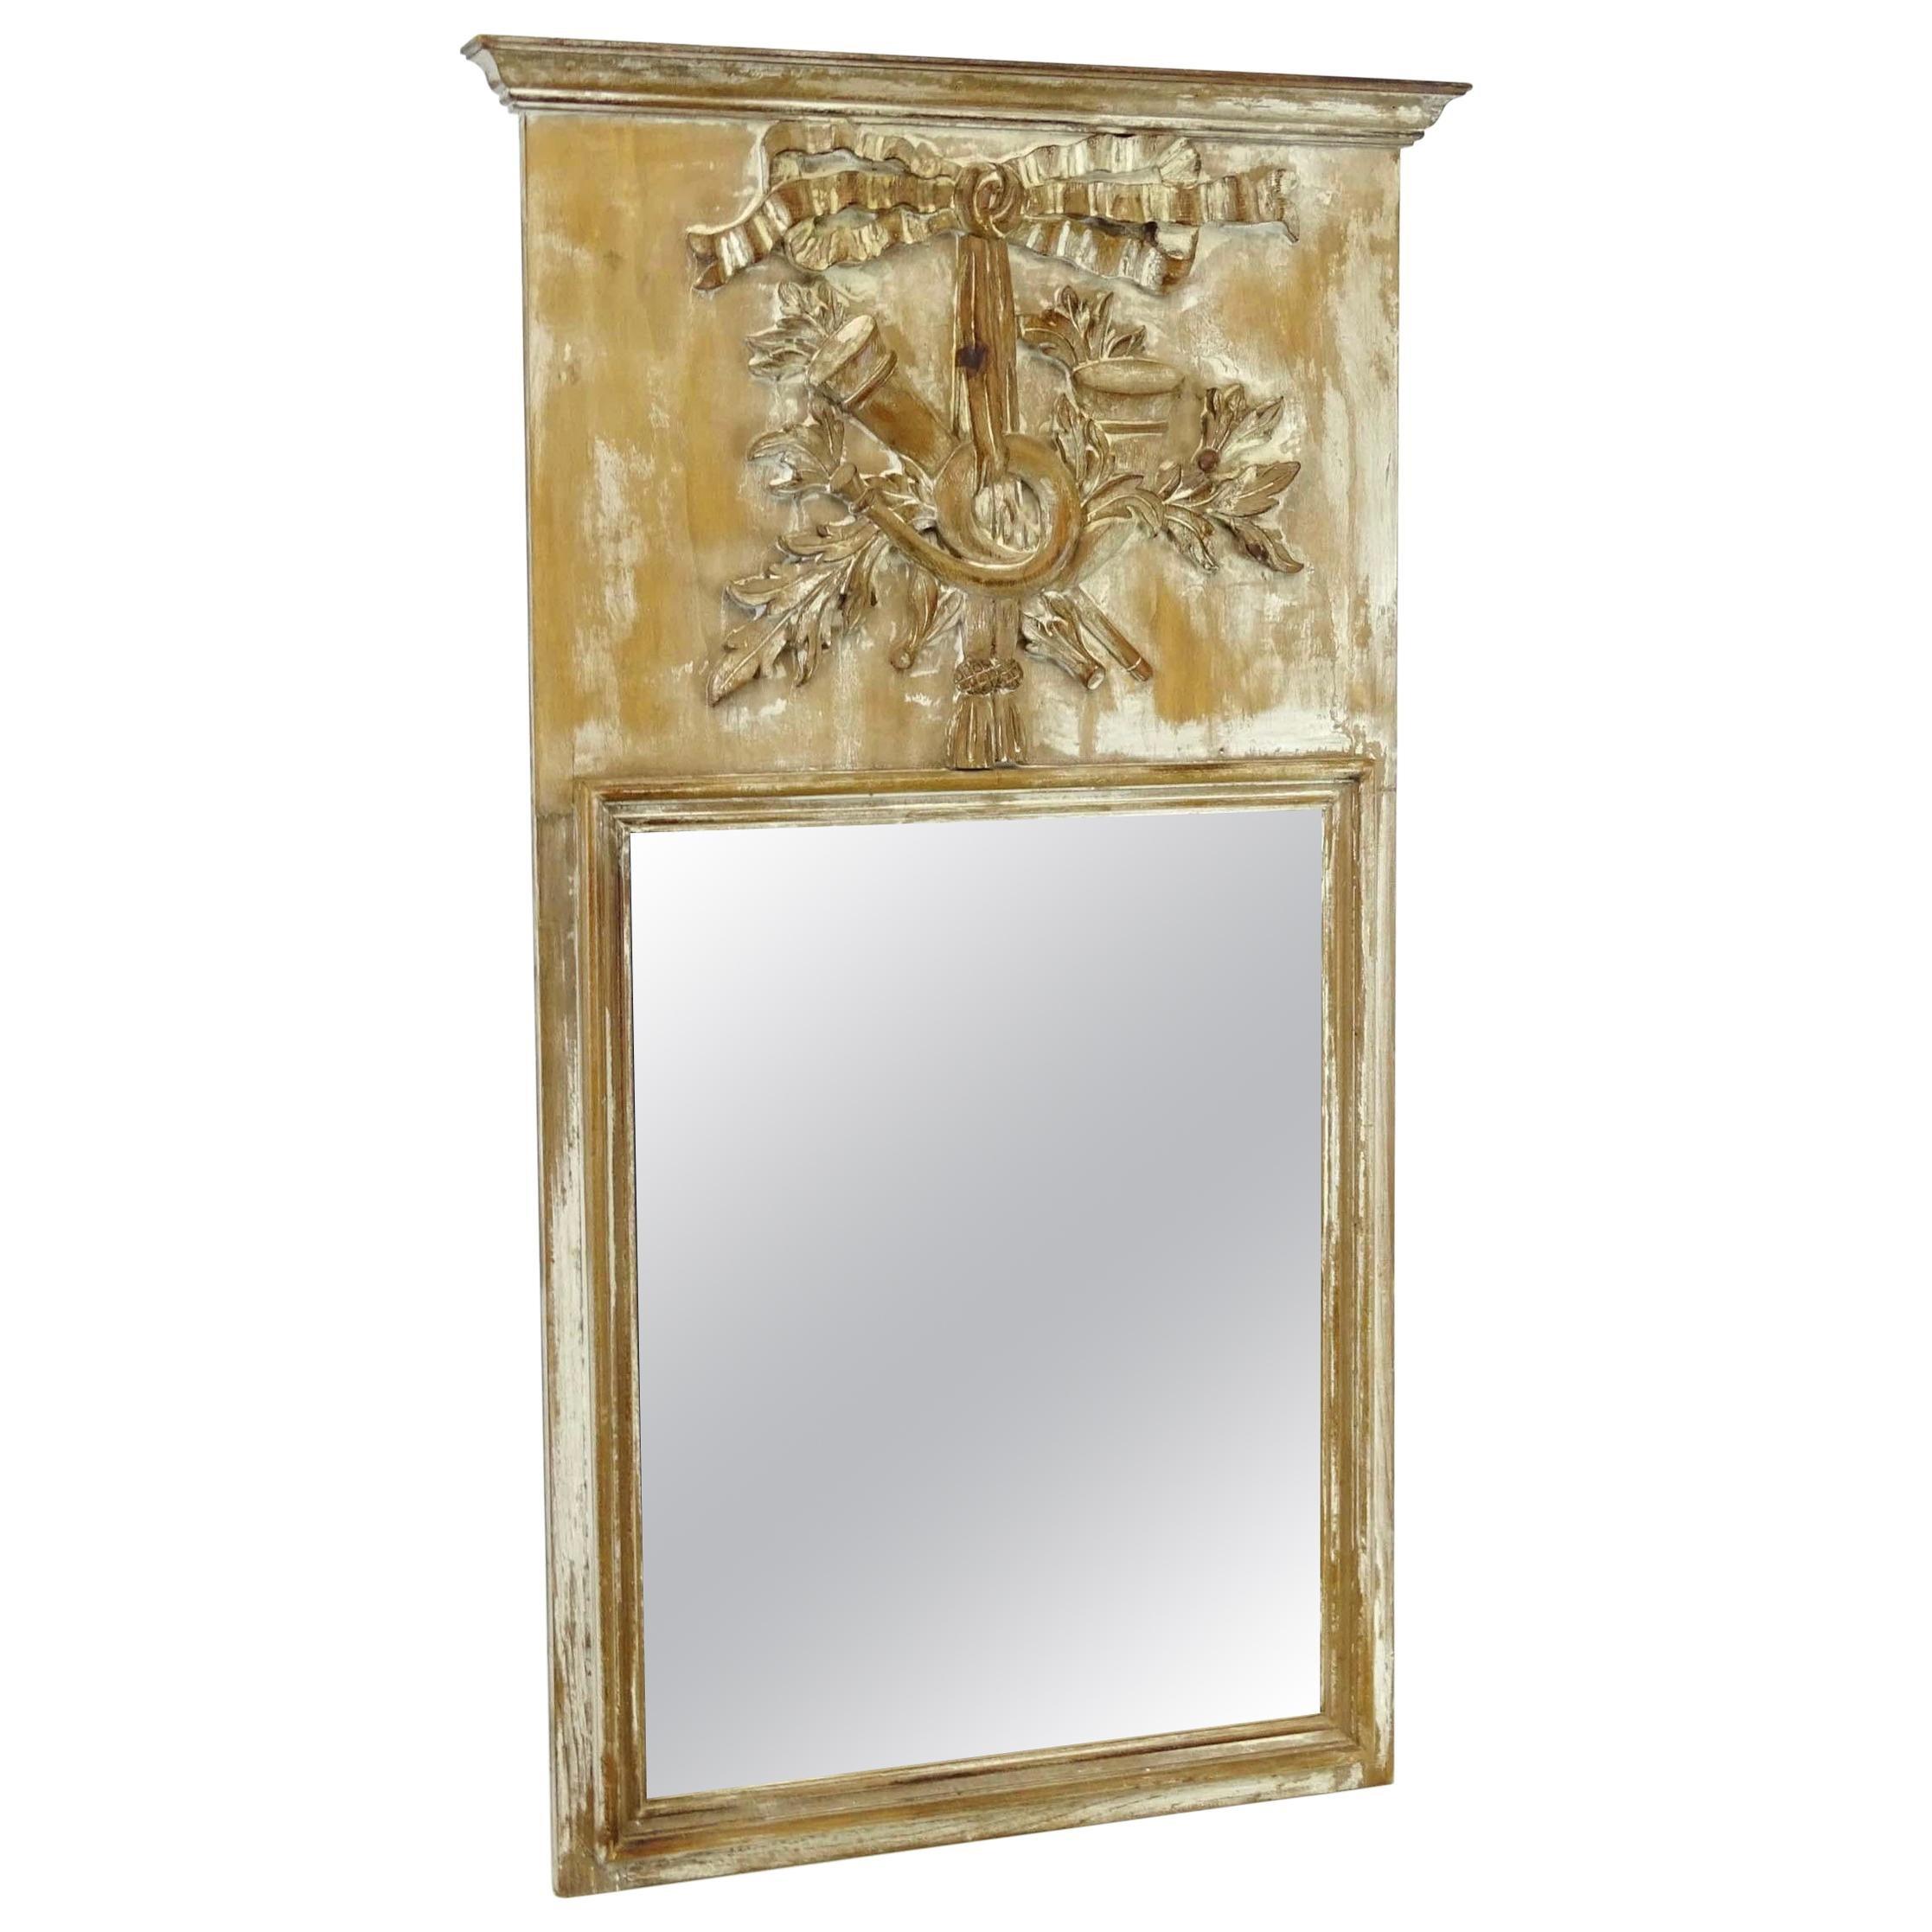 18th Century Louis XV Trumeau Mirror